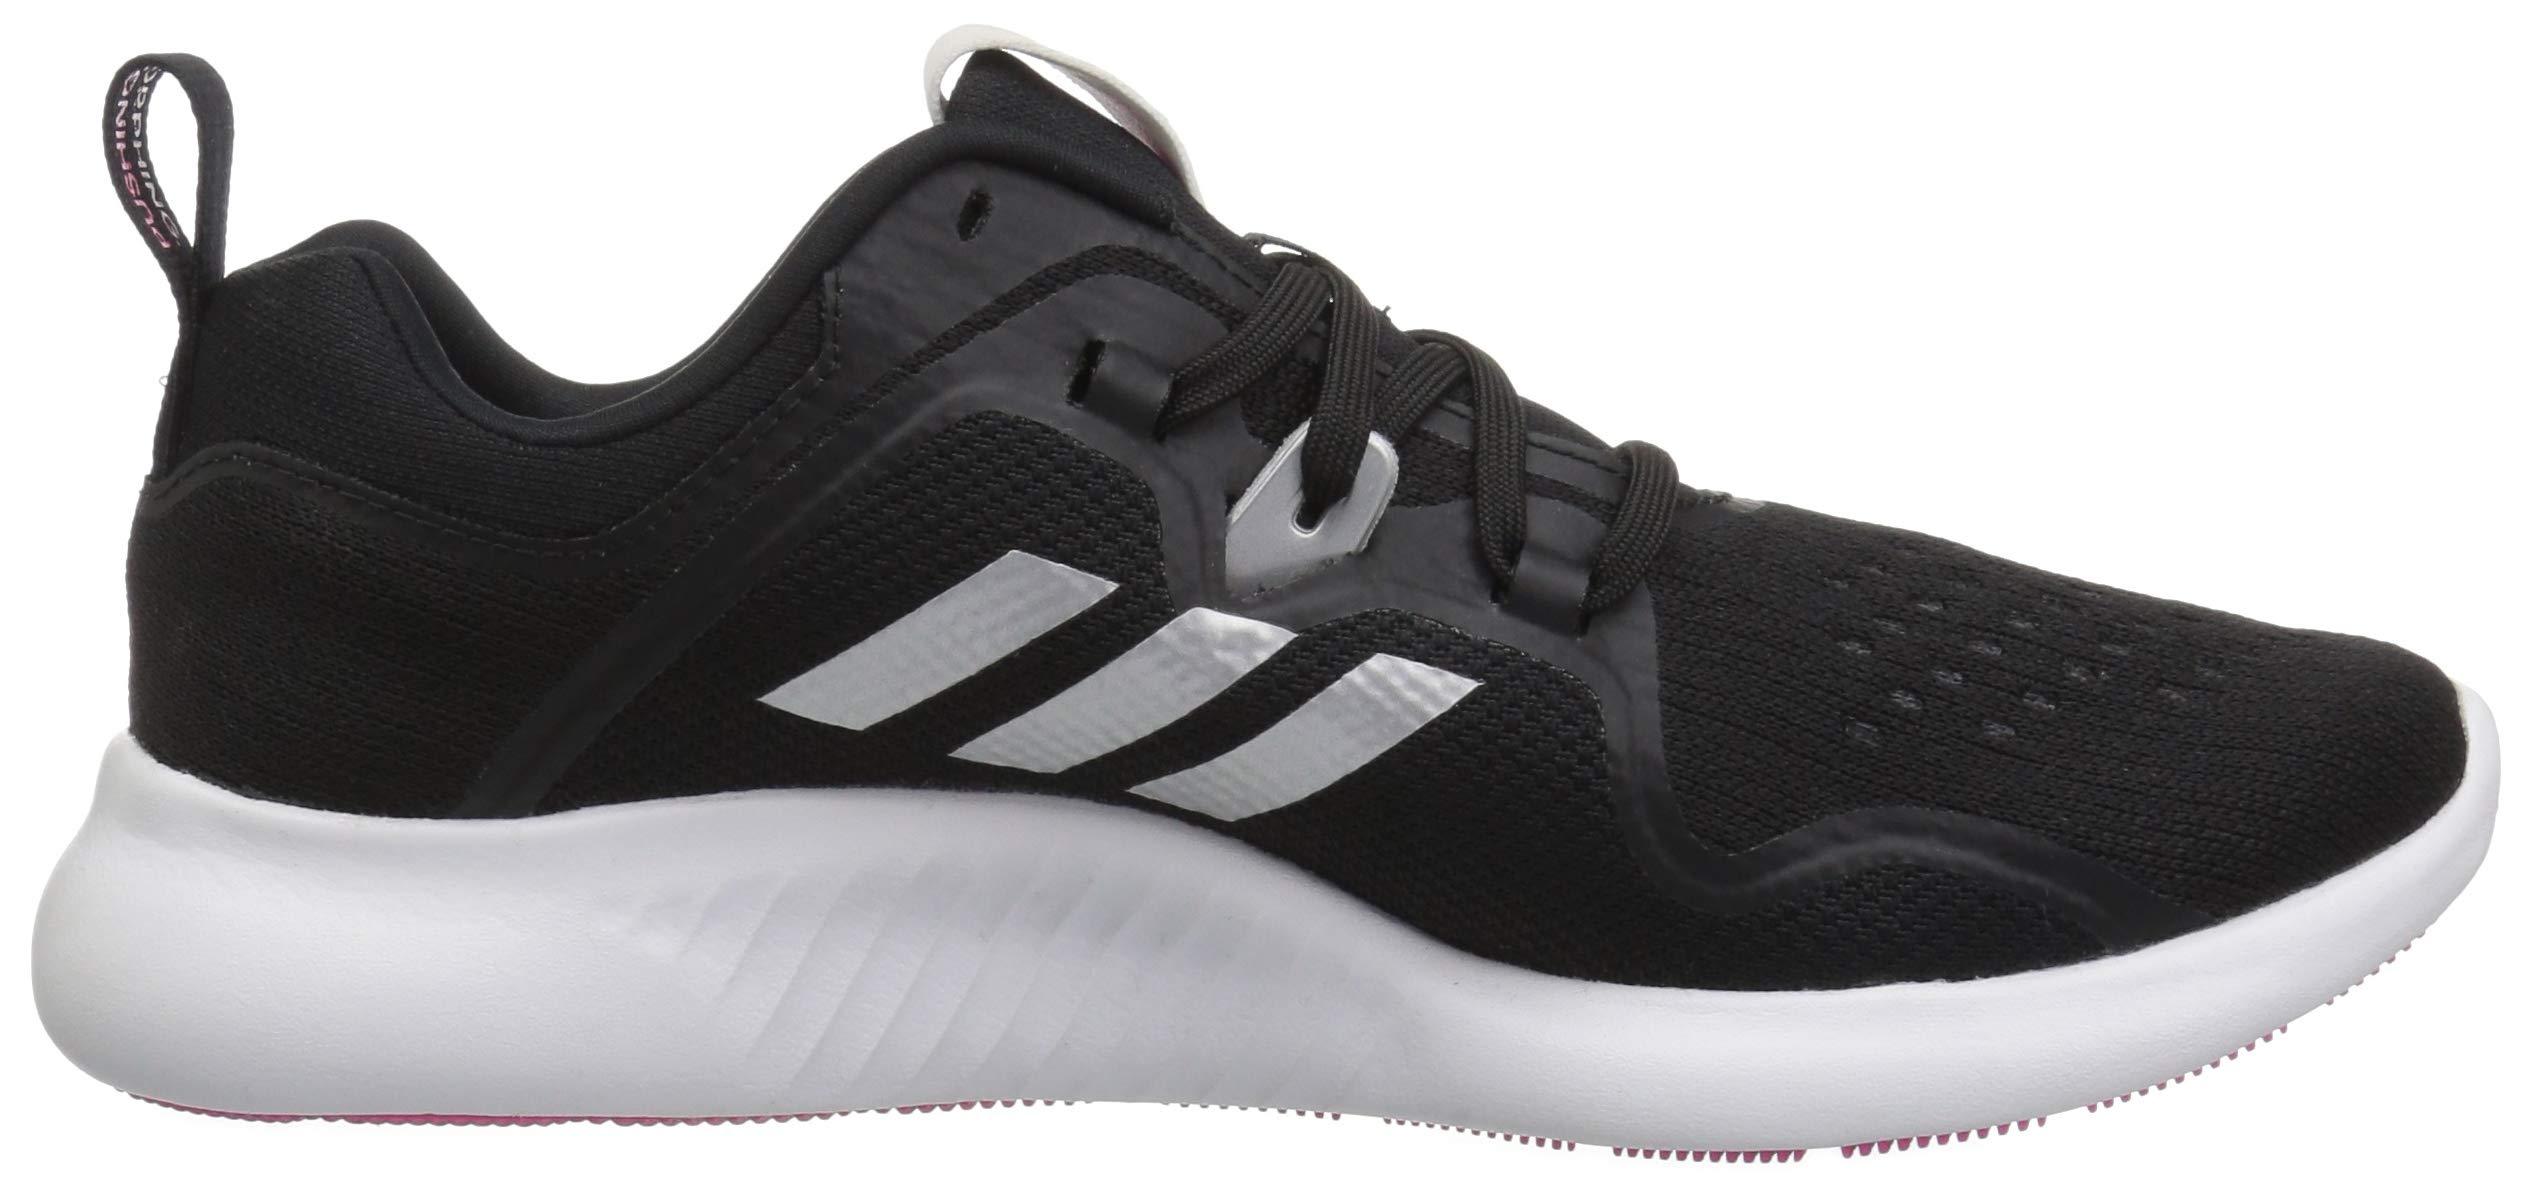 adidas Women's EdgeBounce Running Shoe, Black/Silver Metallic/Shock Pink, 5 M US by adidas (Image #6)